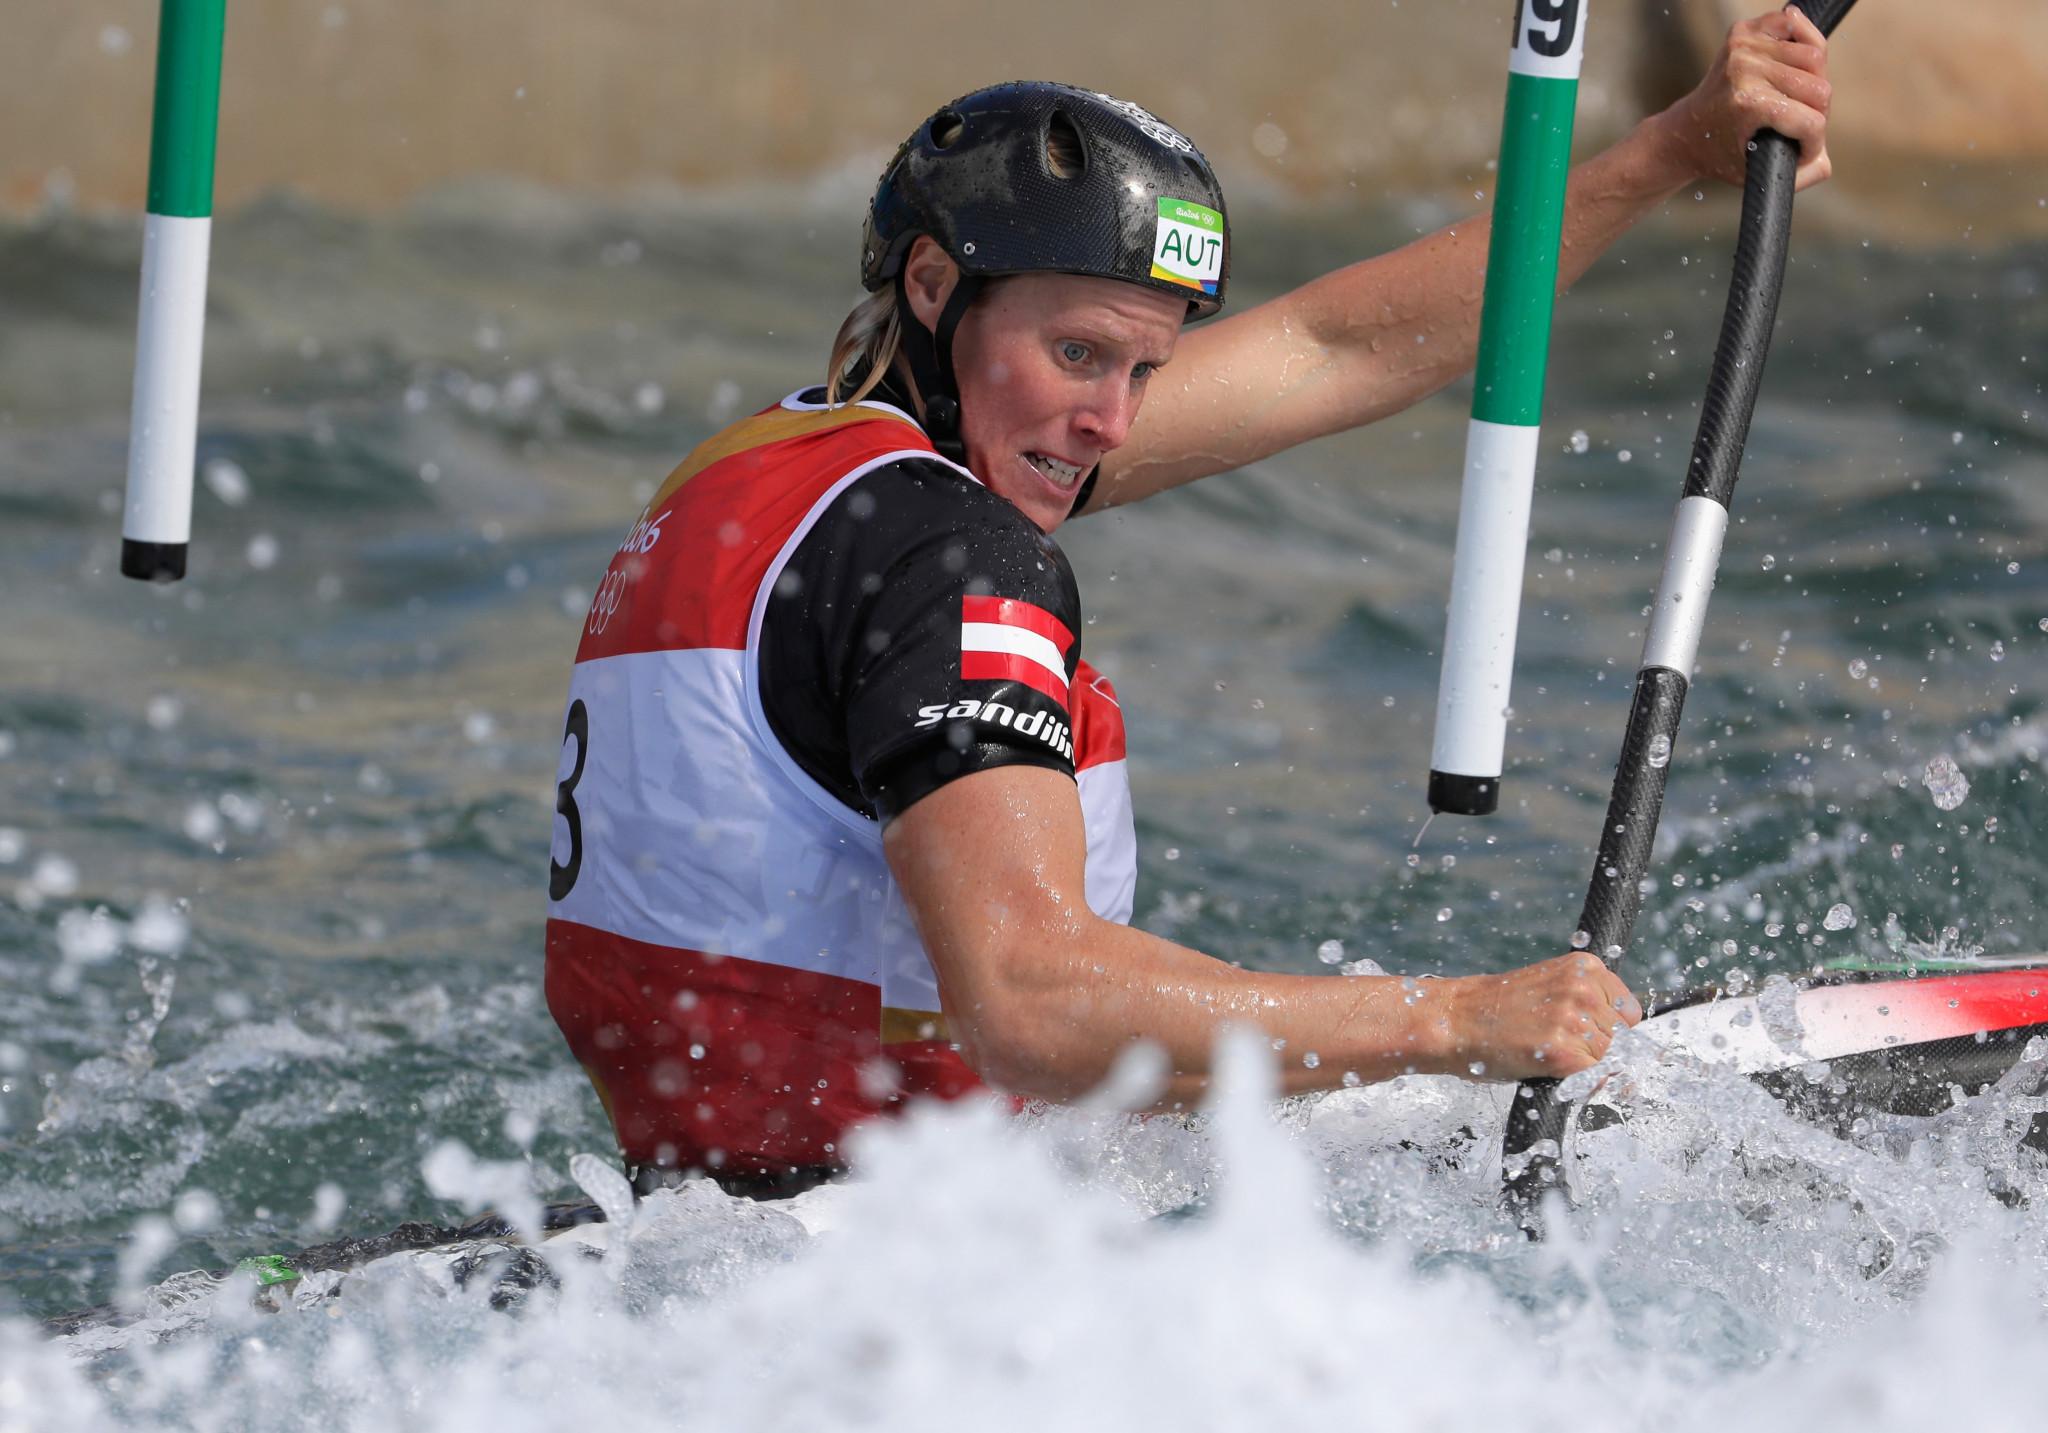 Kuhnle and Prindis win kayak titles at Canoe Slalom European Championships